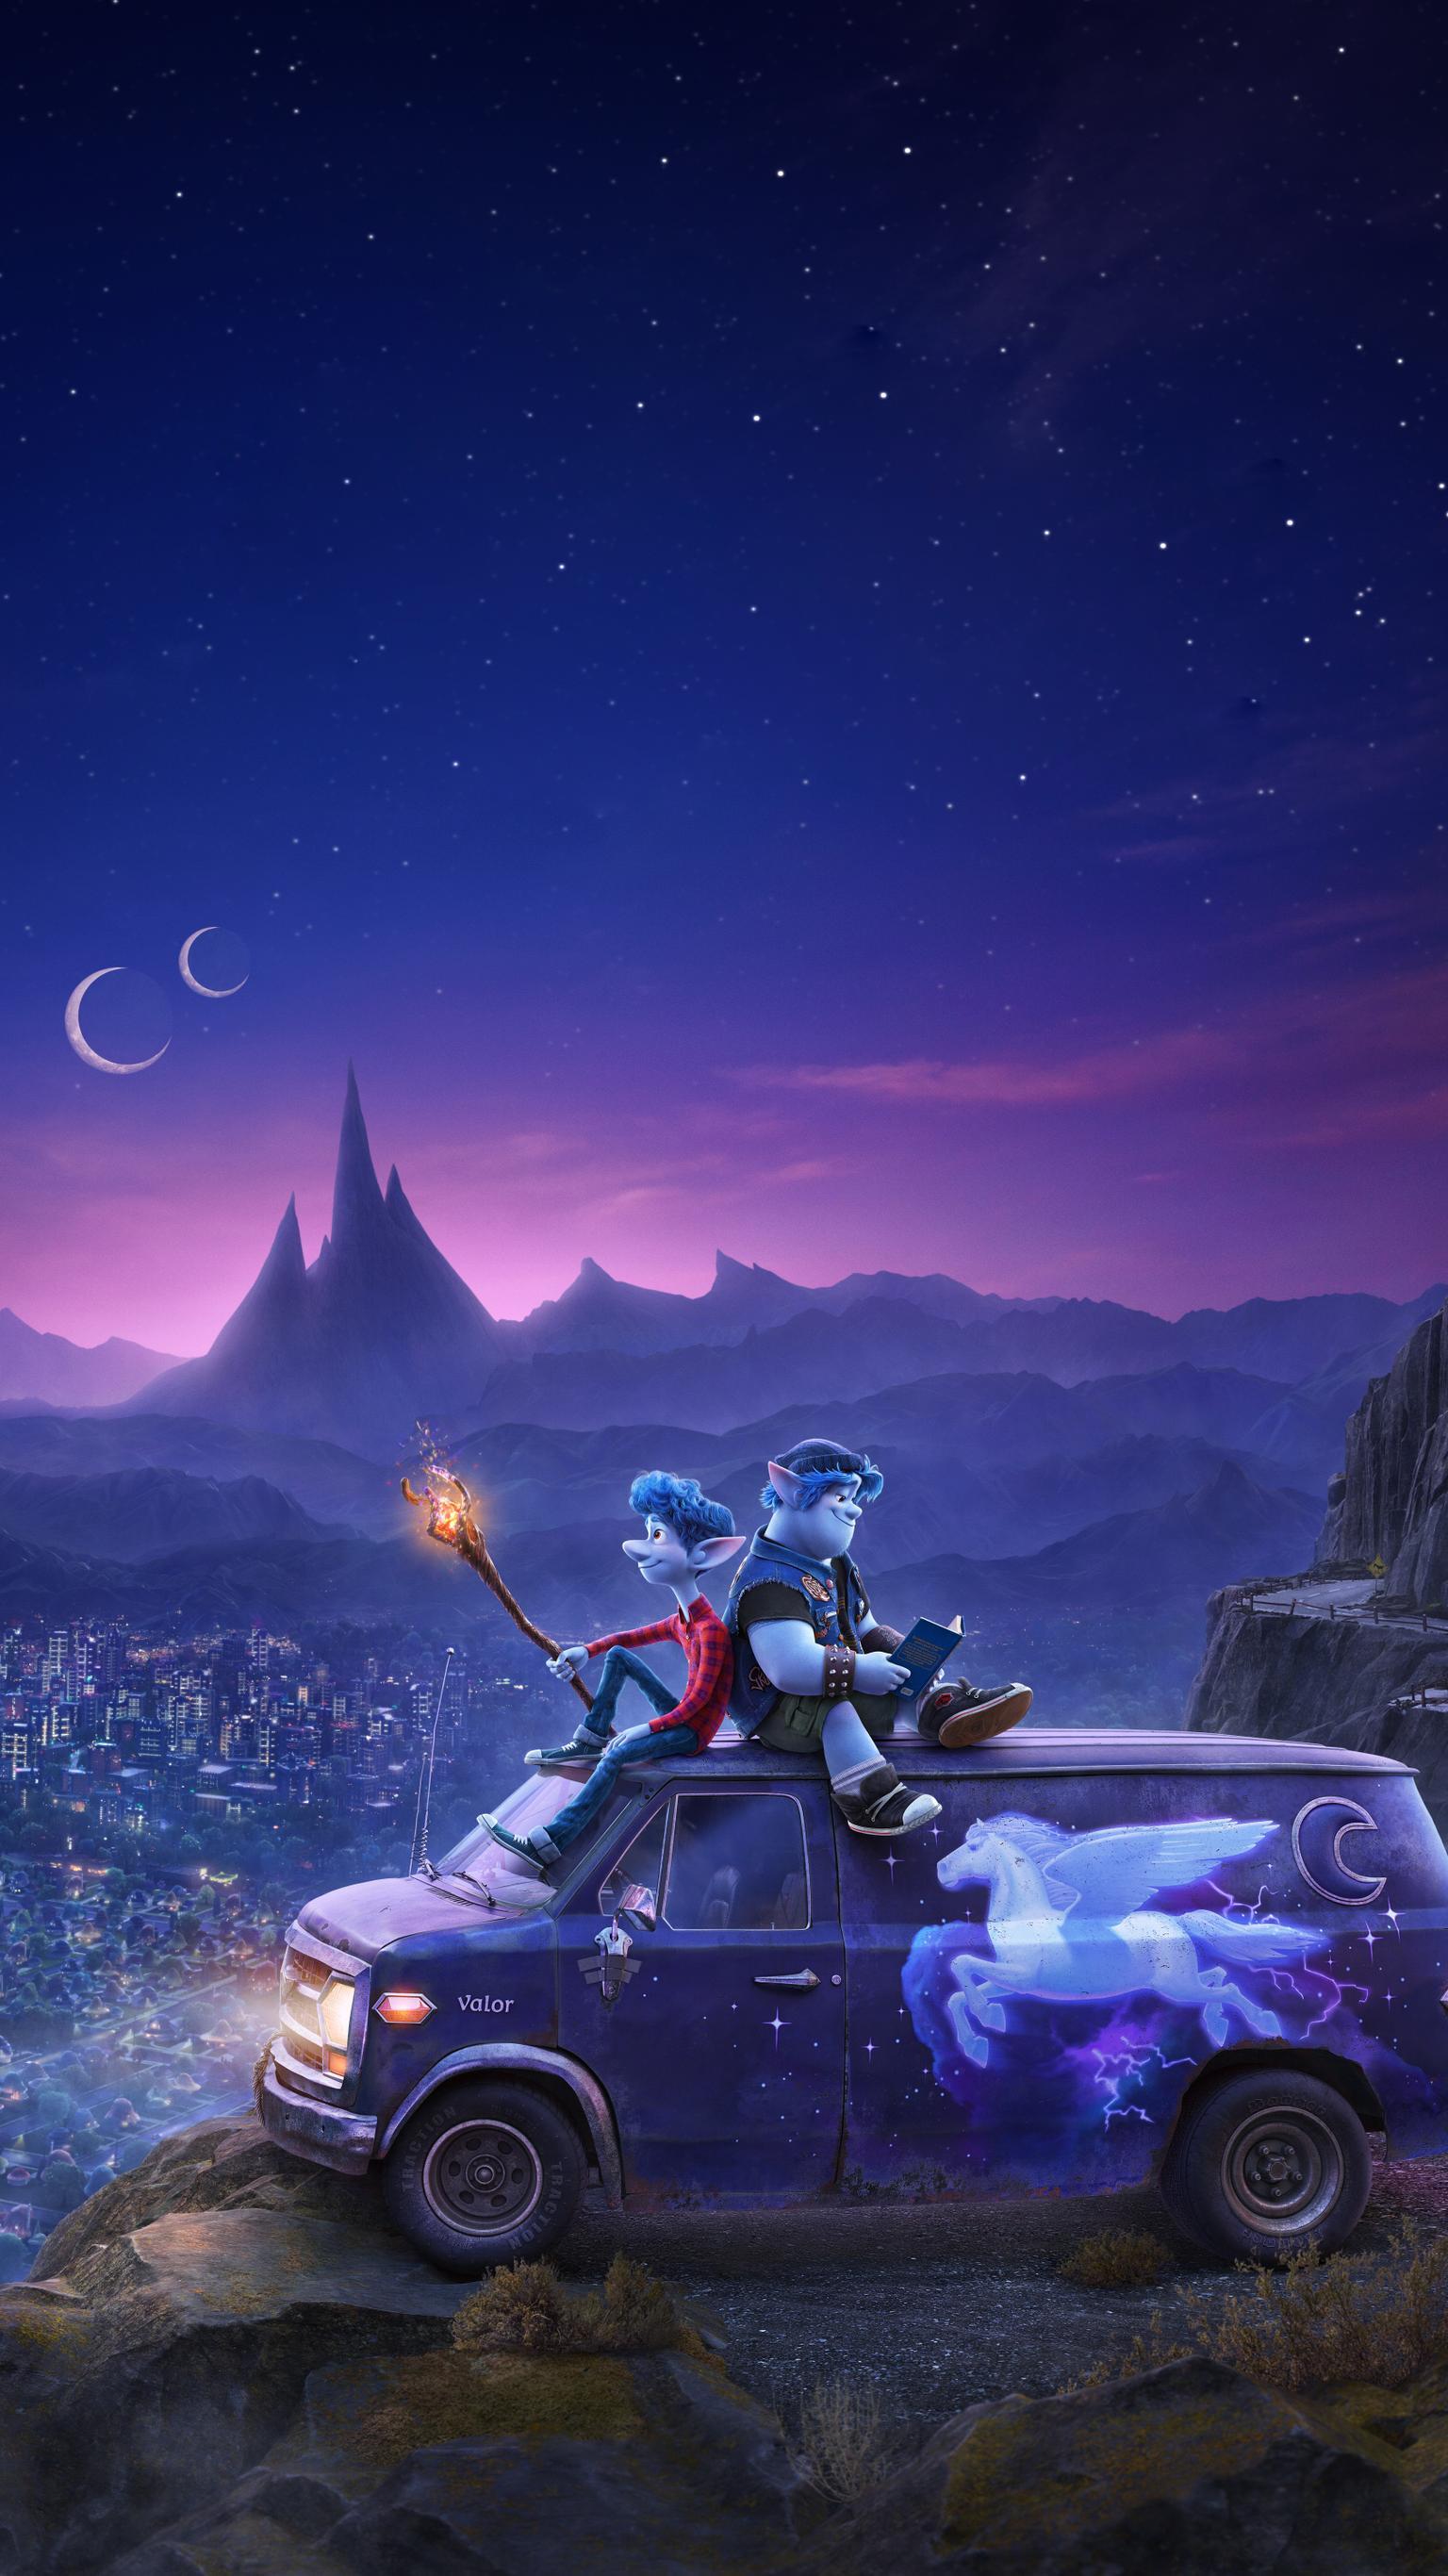 43] Pixars Onward 2020 Wallpapers on WallpaperSafari 1536x2732